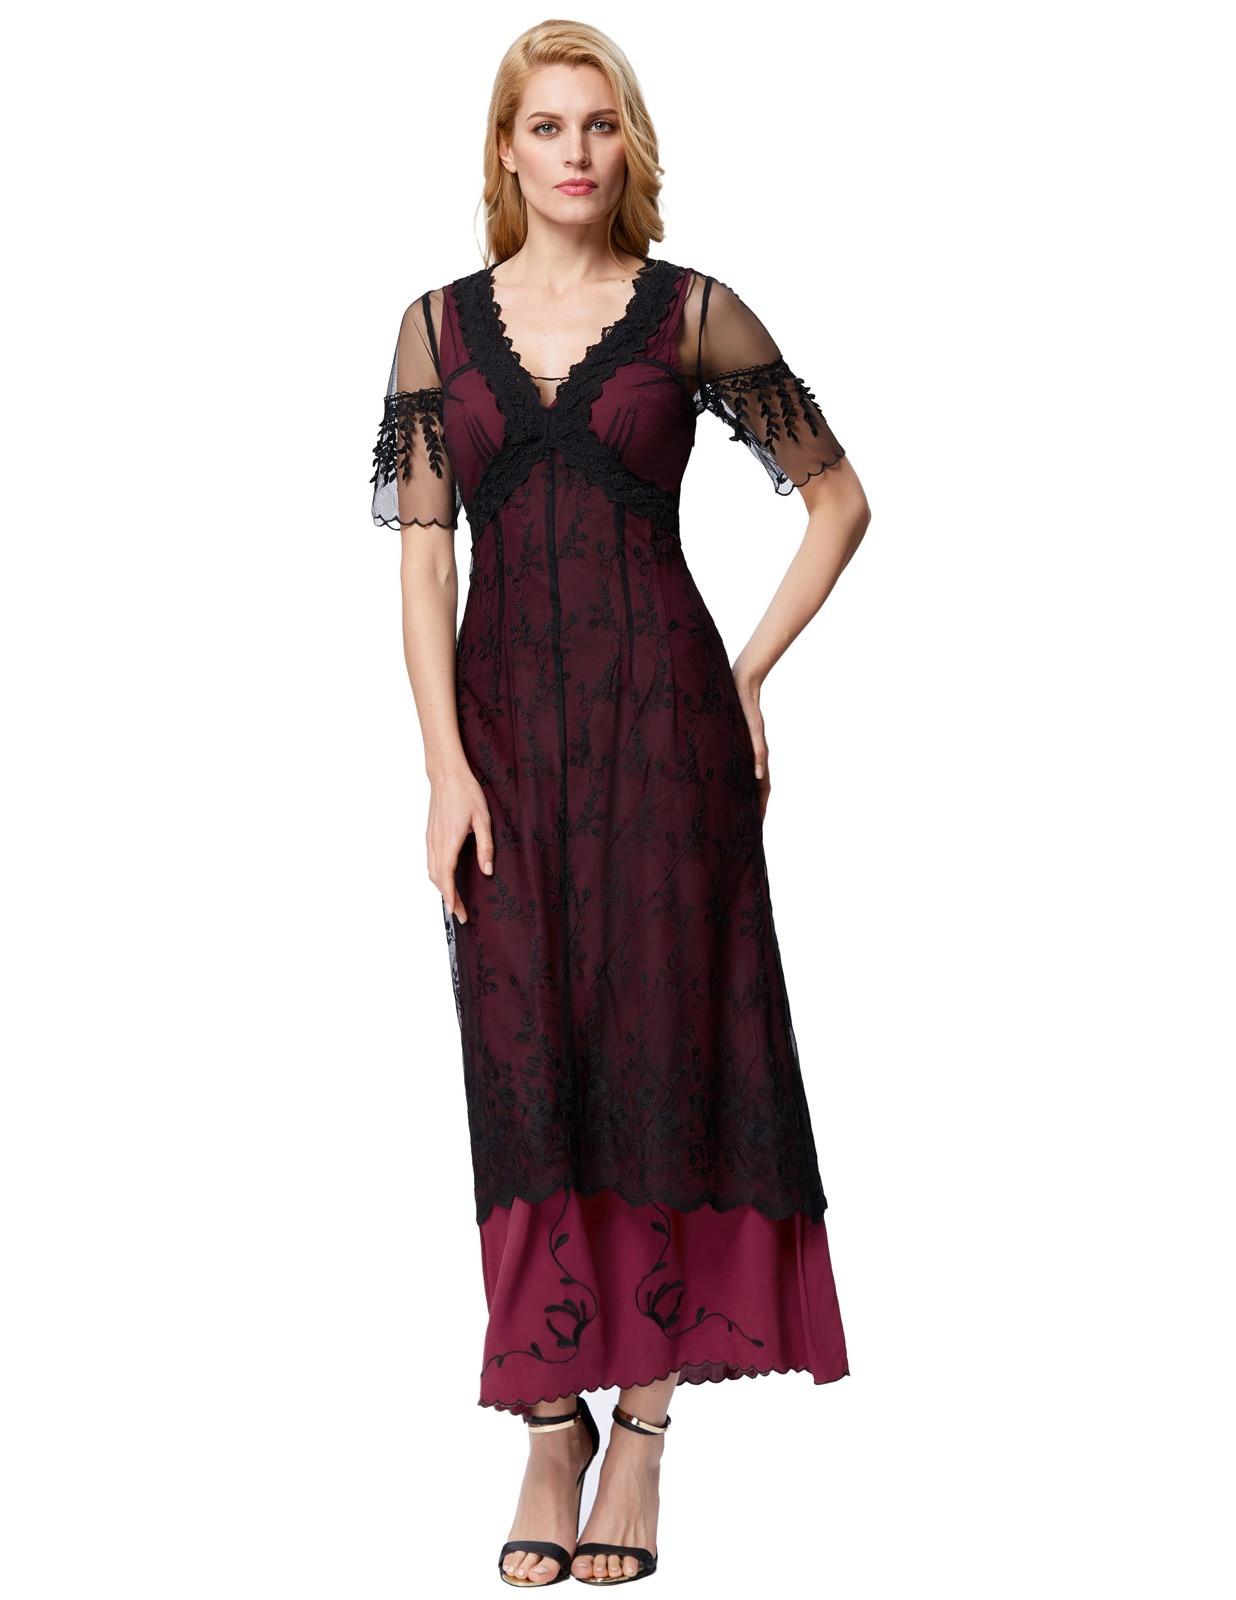 Women Retro Victorian 50s 60s Lace Long Maxi Gown Edwardian Evening Party Dress